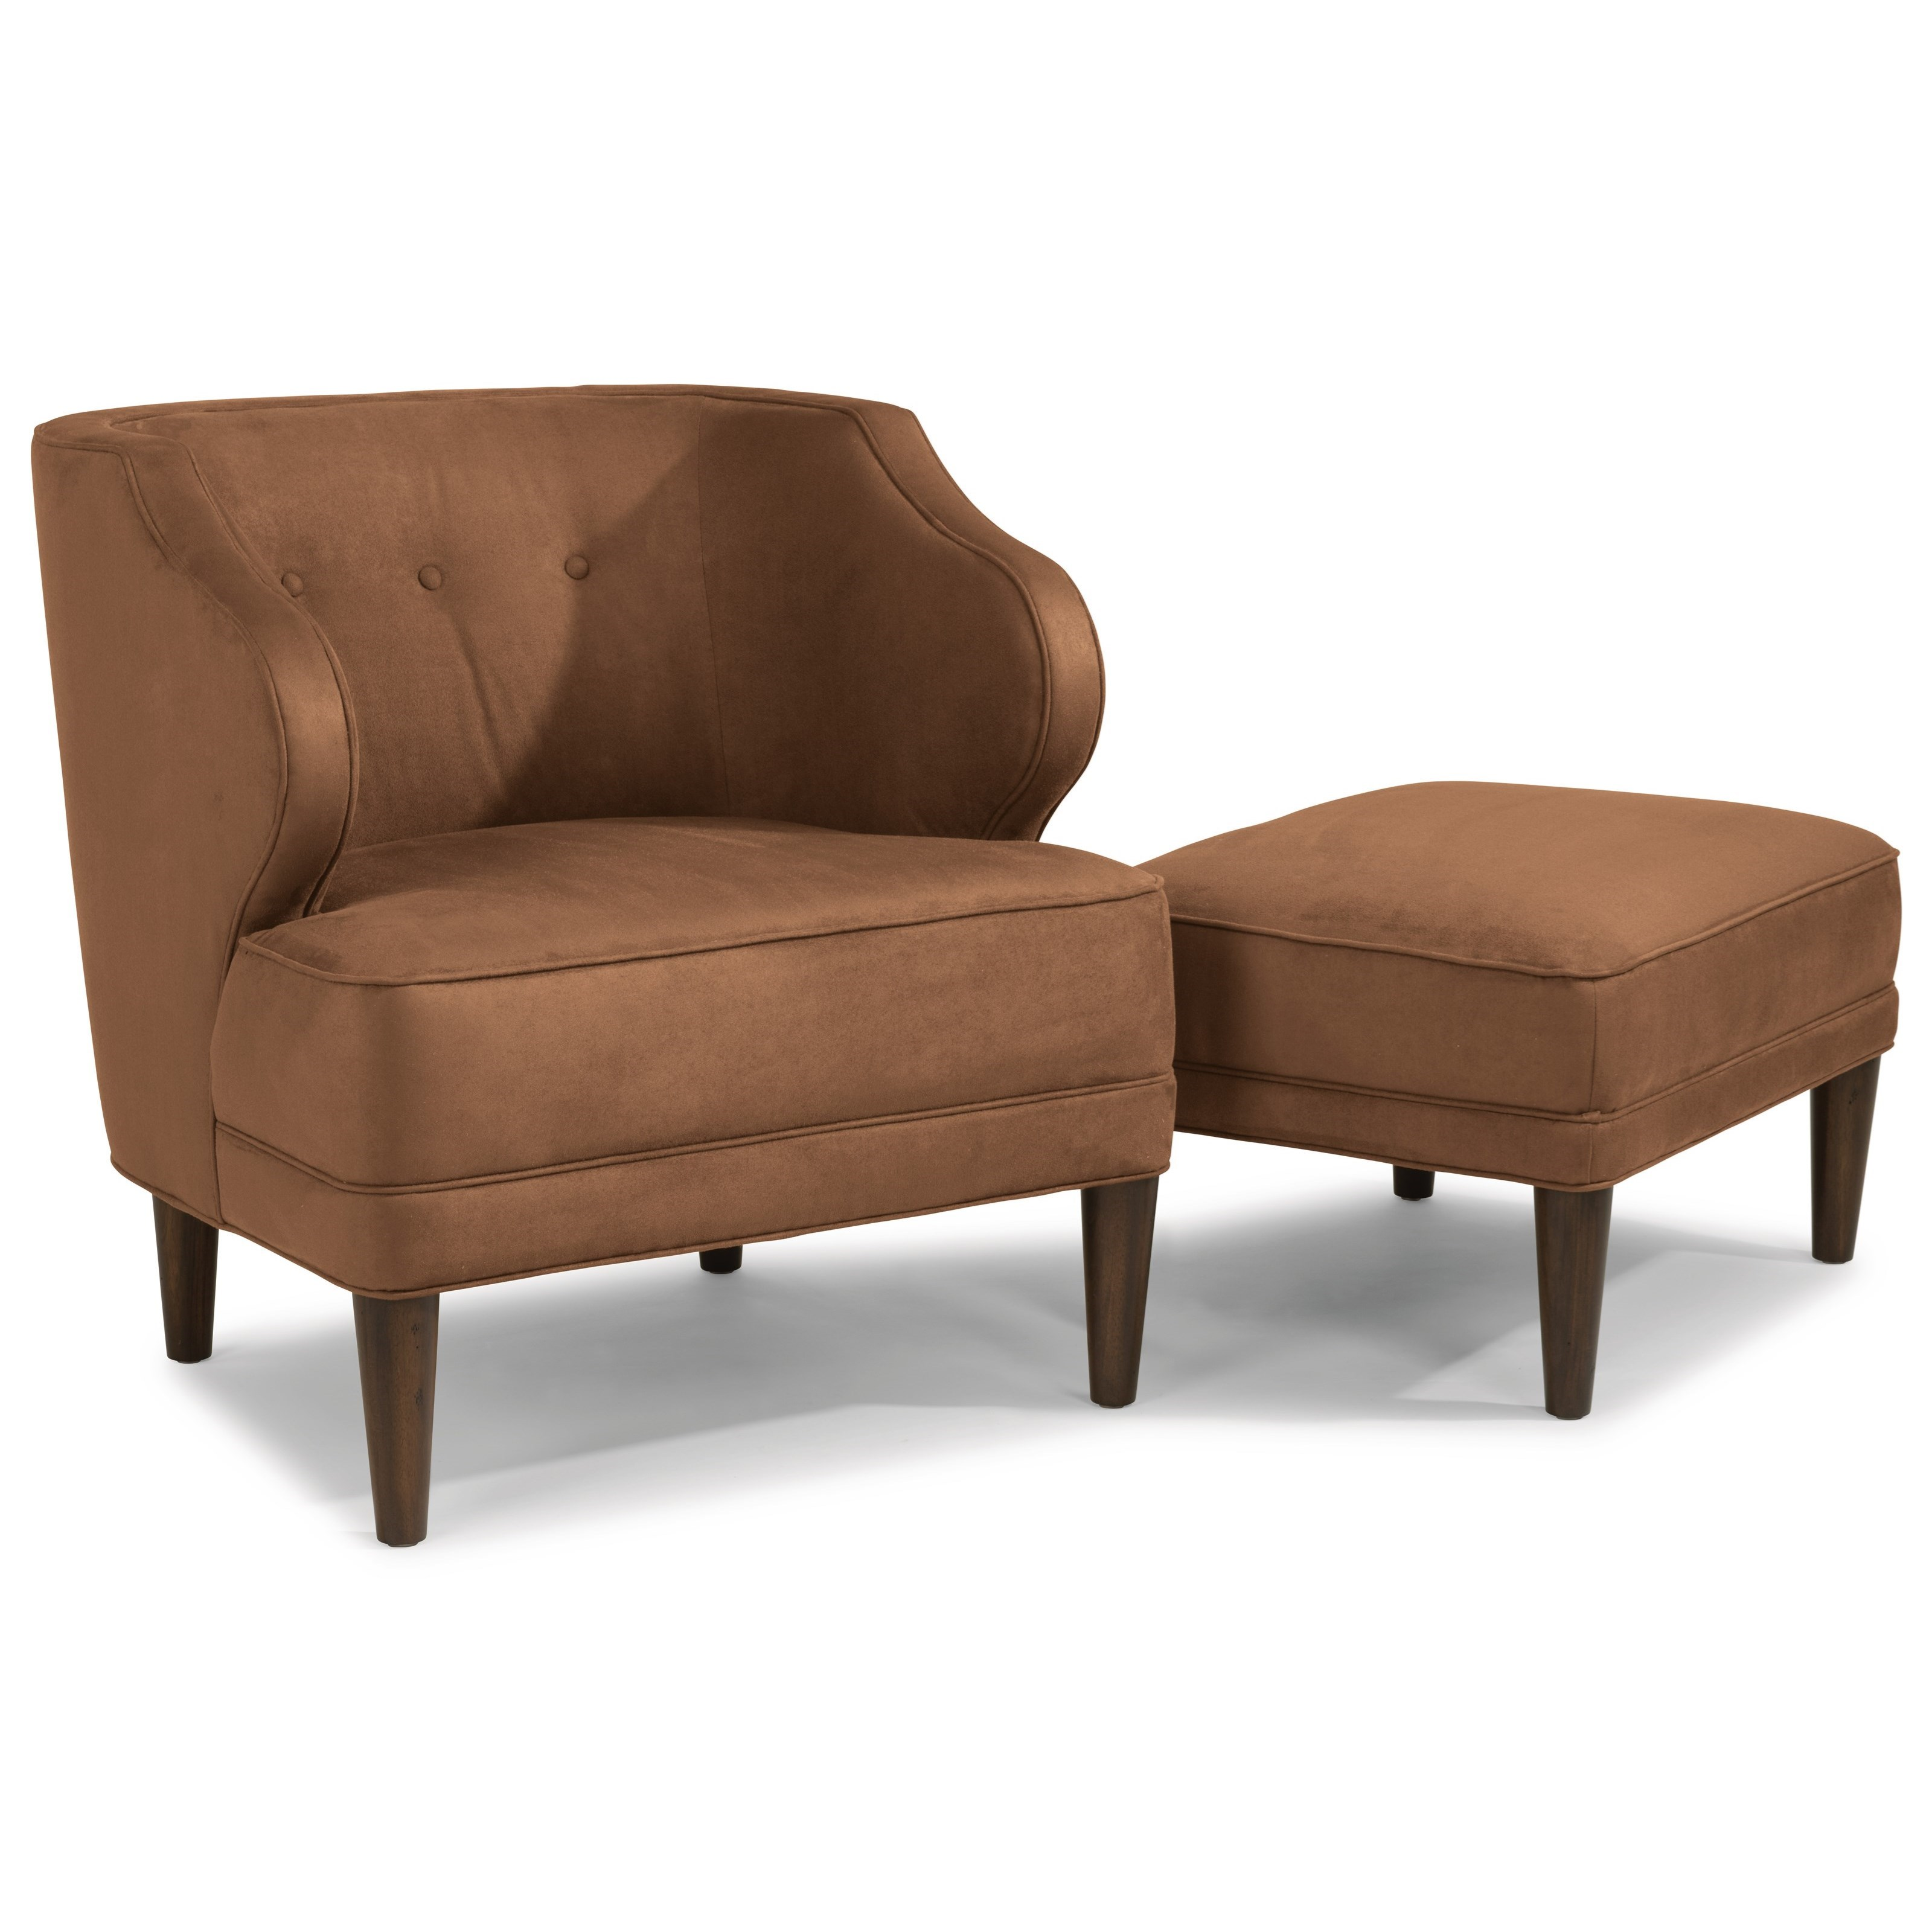 Flexsteel Etta Mid Century Modern Wing Chair With Button